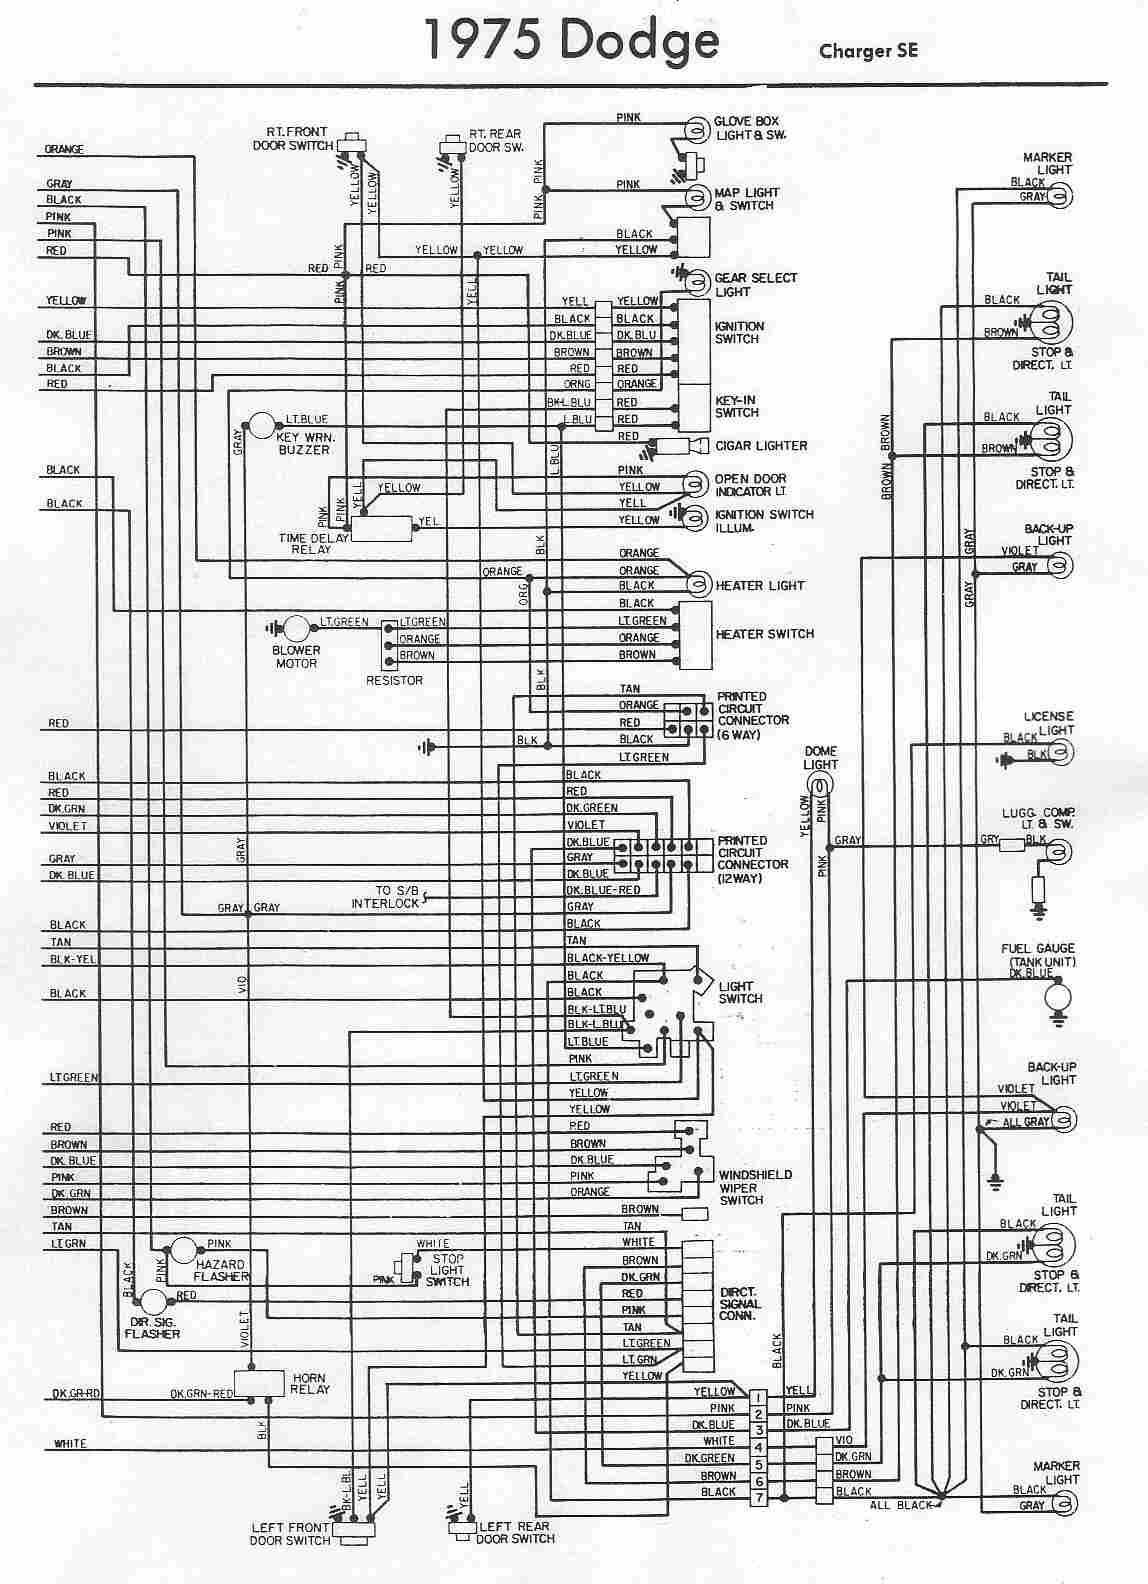 dodge car manuals wiring diagrams pdf fault codes